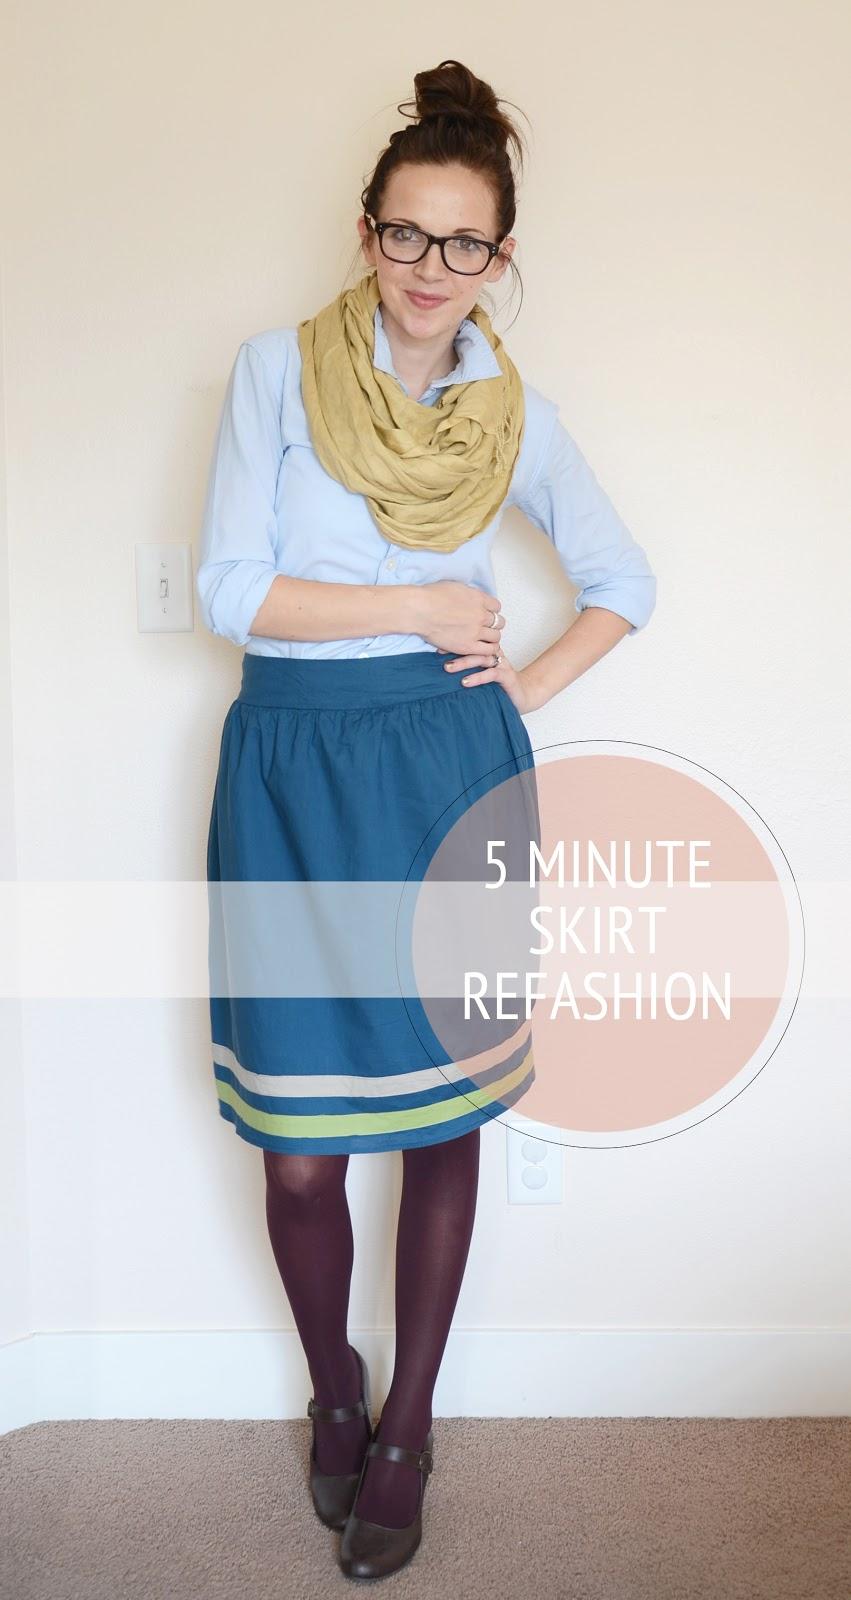 5 minute skirt refashion tutorial merrick s art